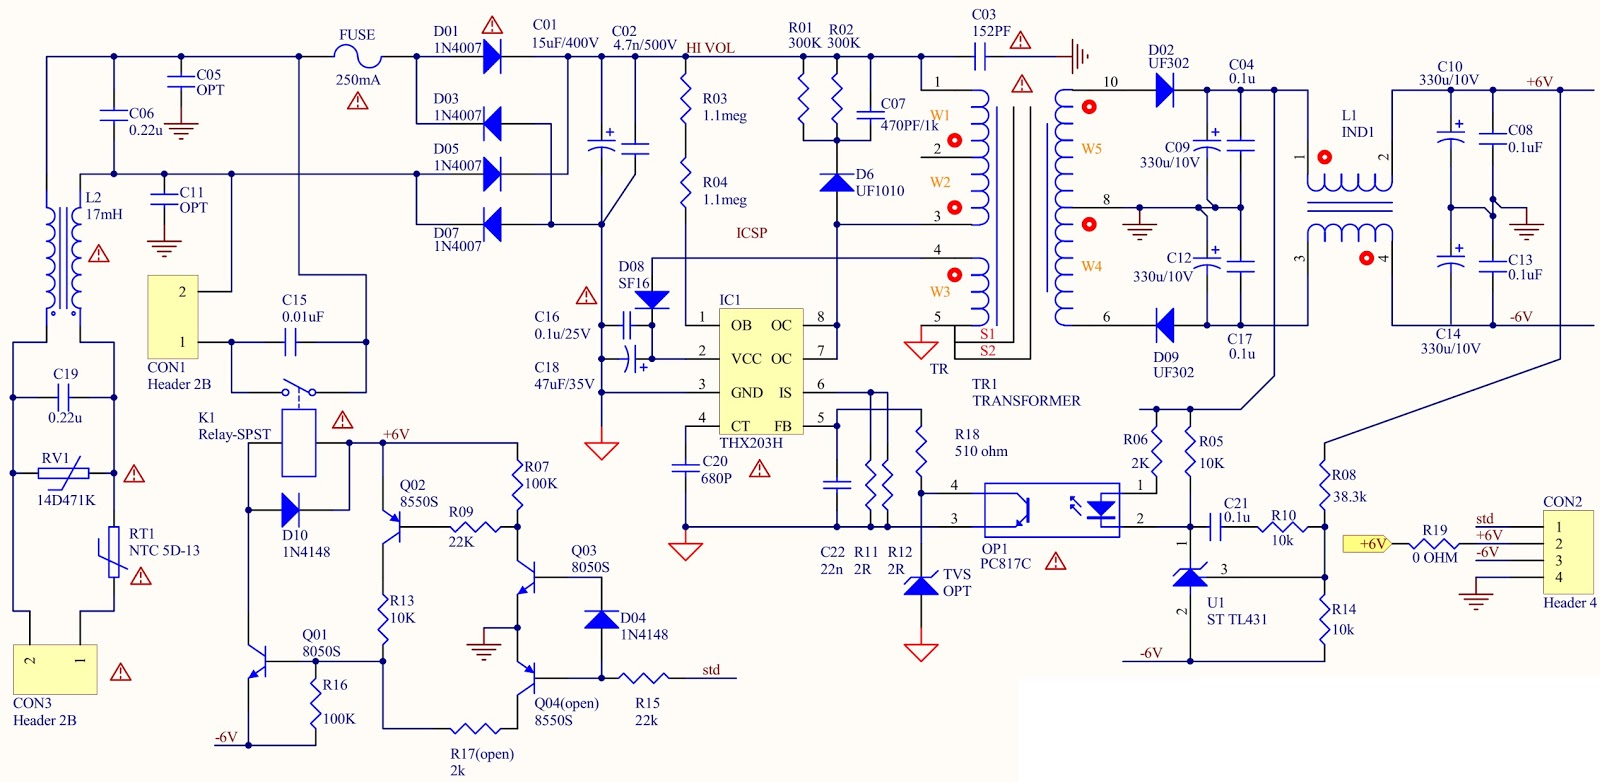 medium resolution of  power bmp jbl sub150 jbl sub230 active sub woofer schematic circuit plasma cutter circuit